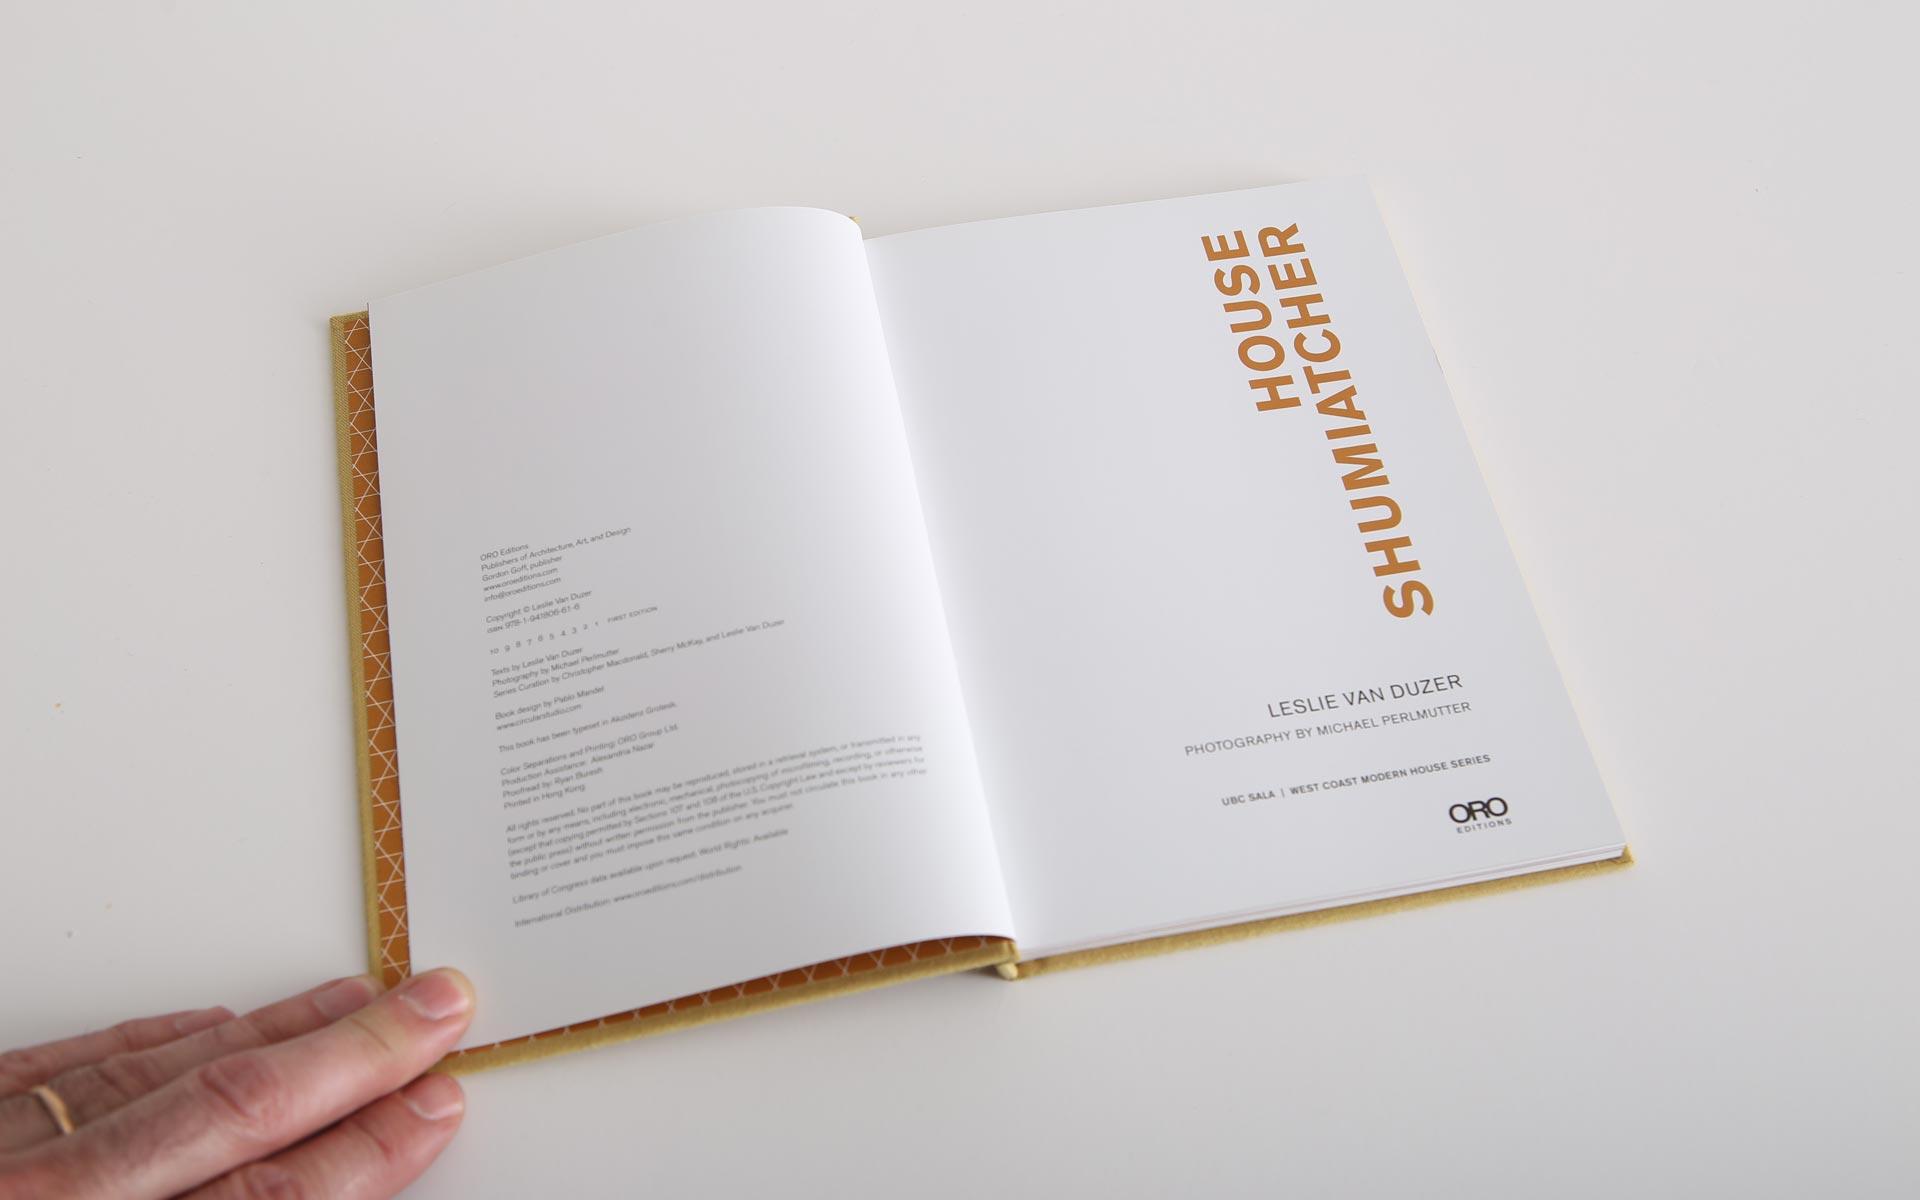 shumiatcher-ubc-sala-book-design-3